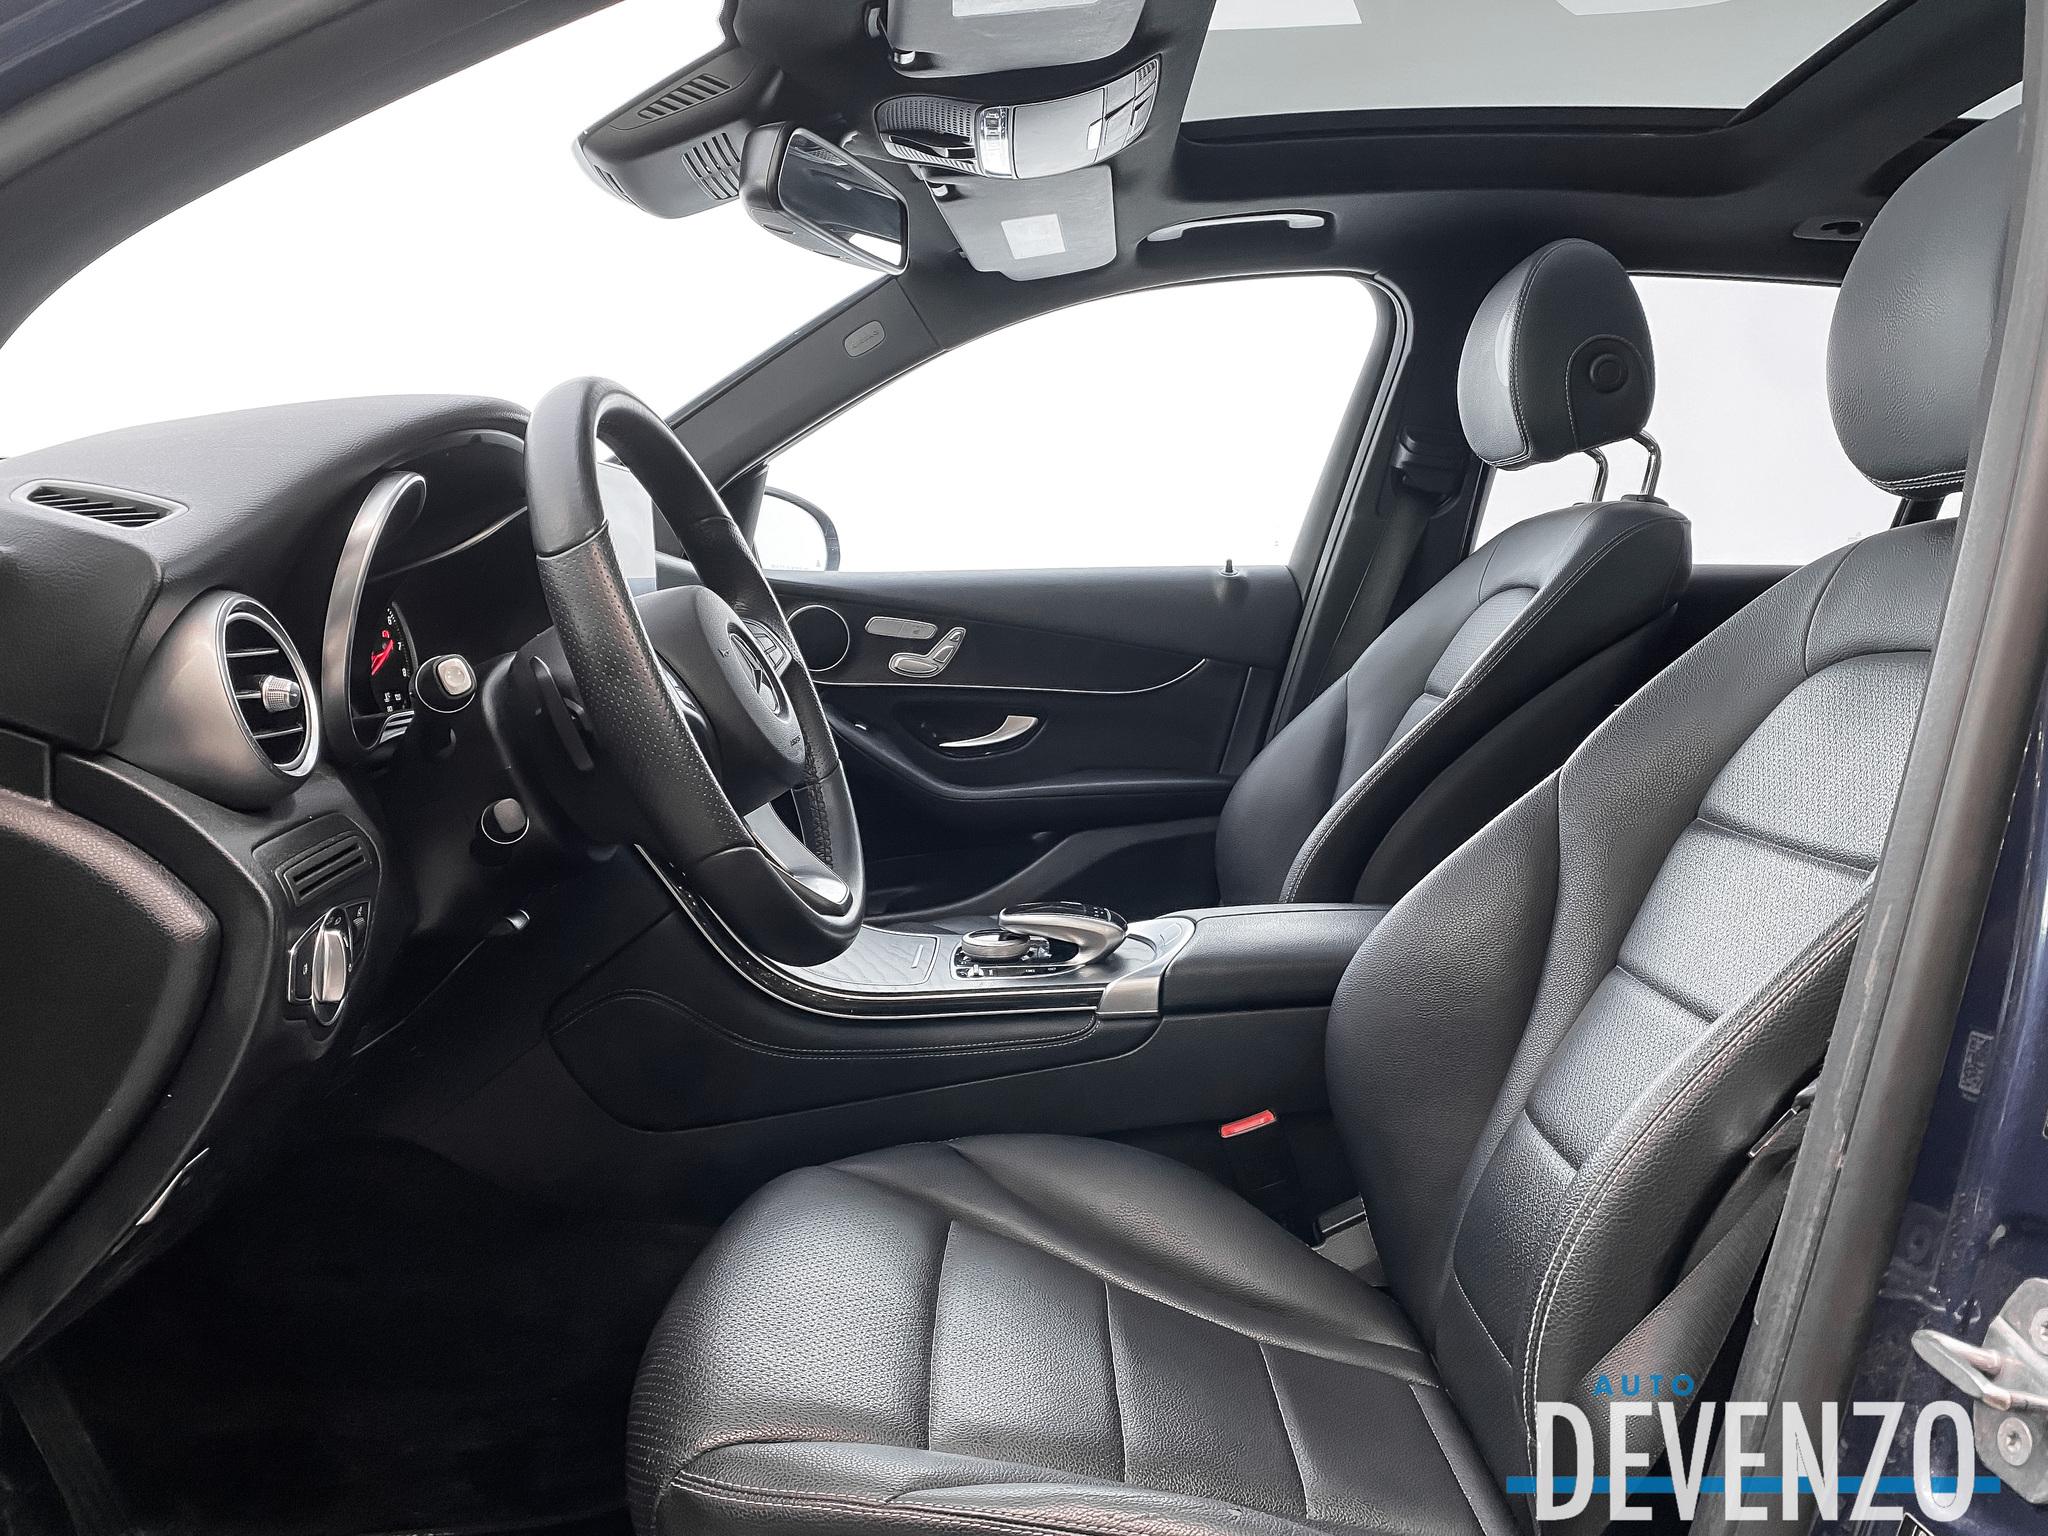 2018 Mercedes-Benz GLC GLC300 4MATIC PREMIUM NAVI / TOIT PANO / CAMERA complet